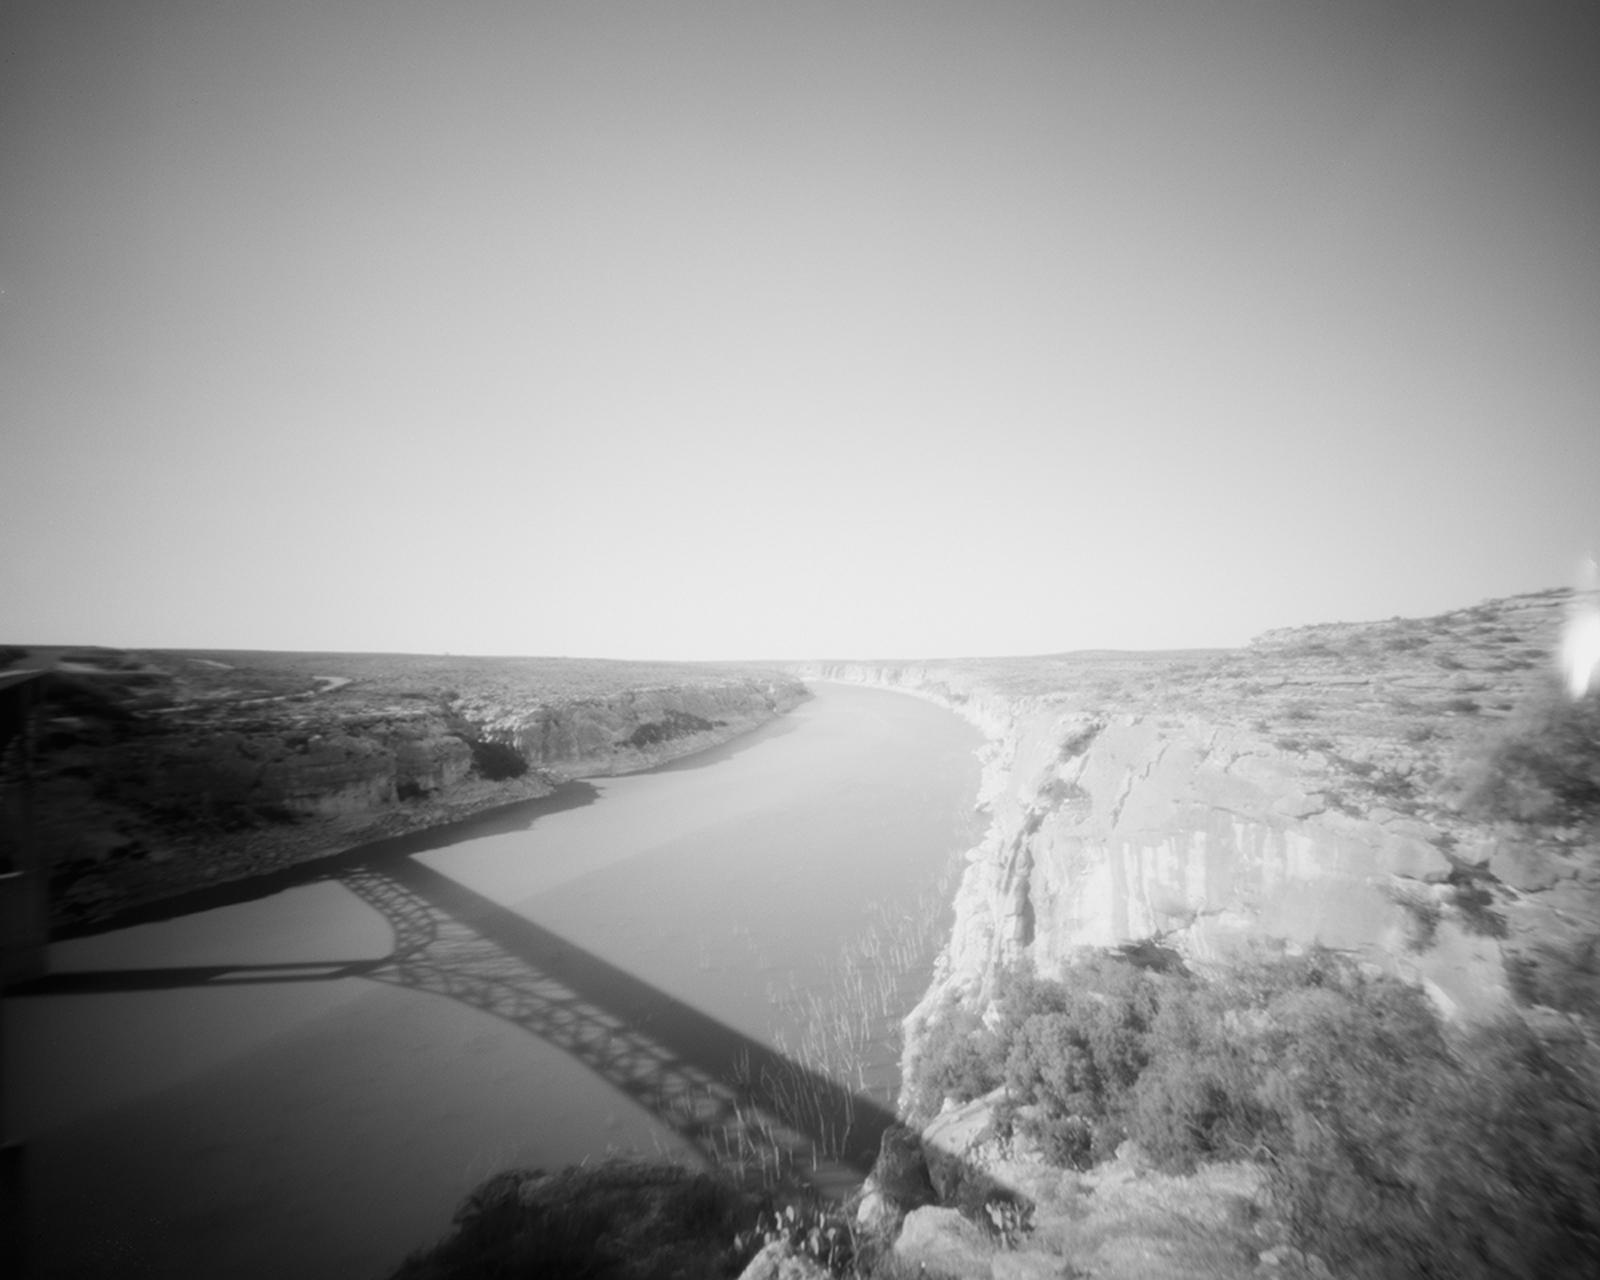 US 90 (Pecos River Bridge, TX)